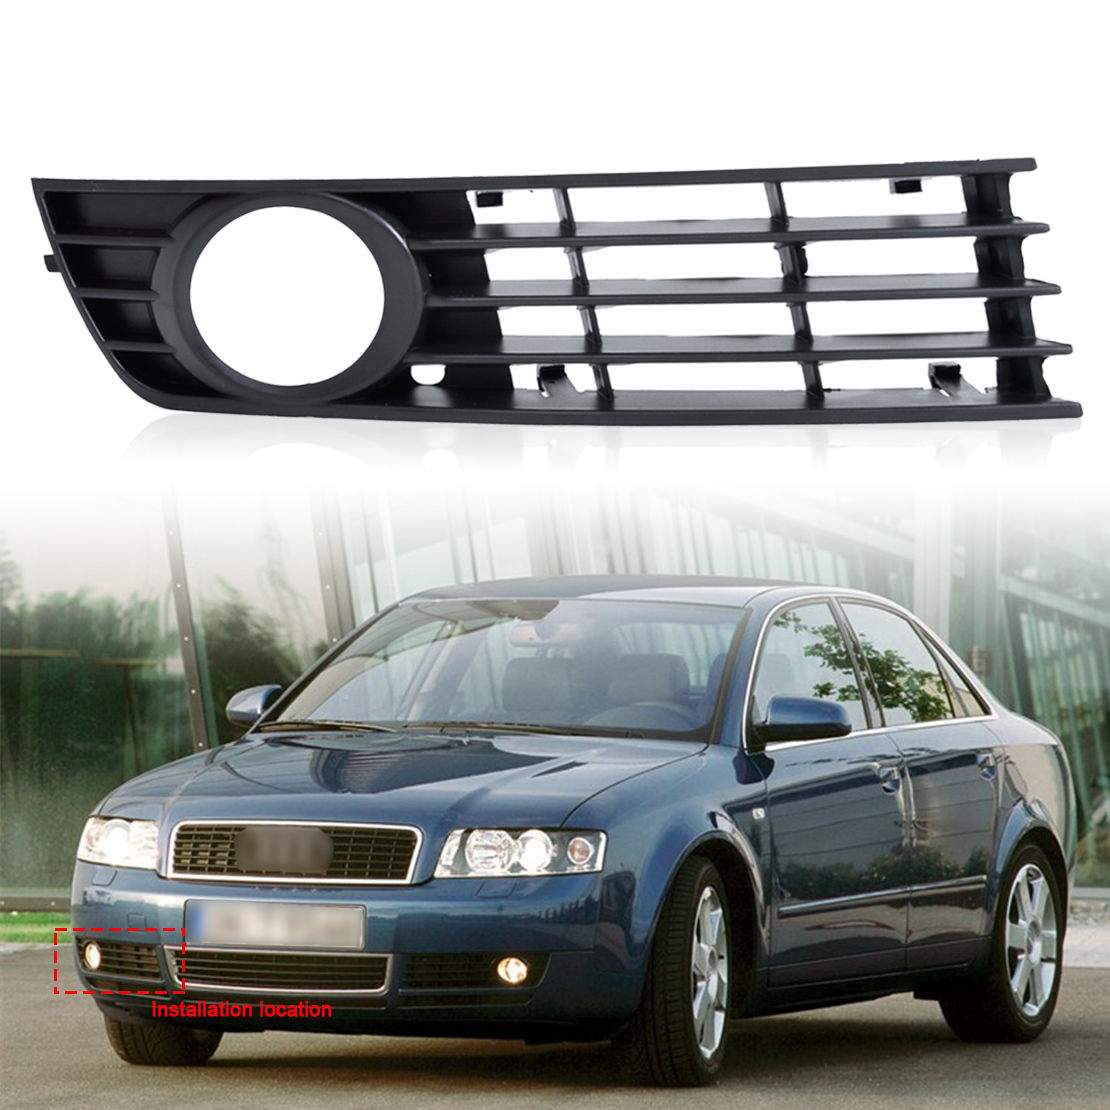 DWCX 8E0807682 Front Right Insert Bumper Fog Light Grille Protective Mesh for Audi A4 B6 2002 2003 2004 2005